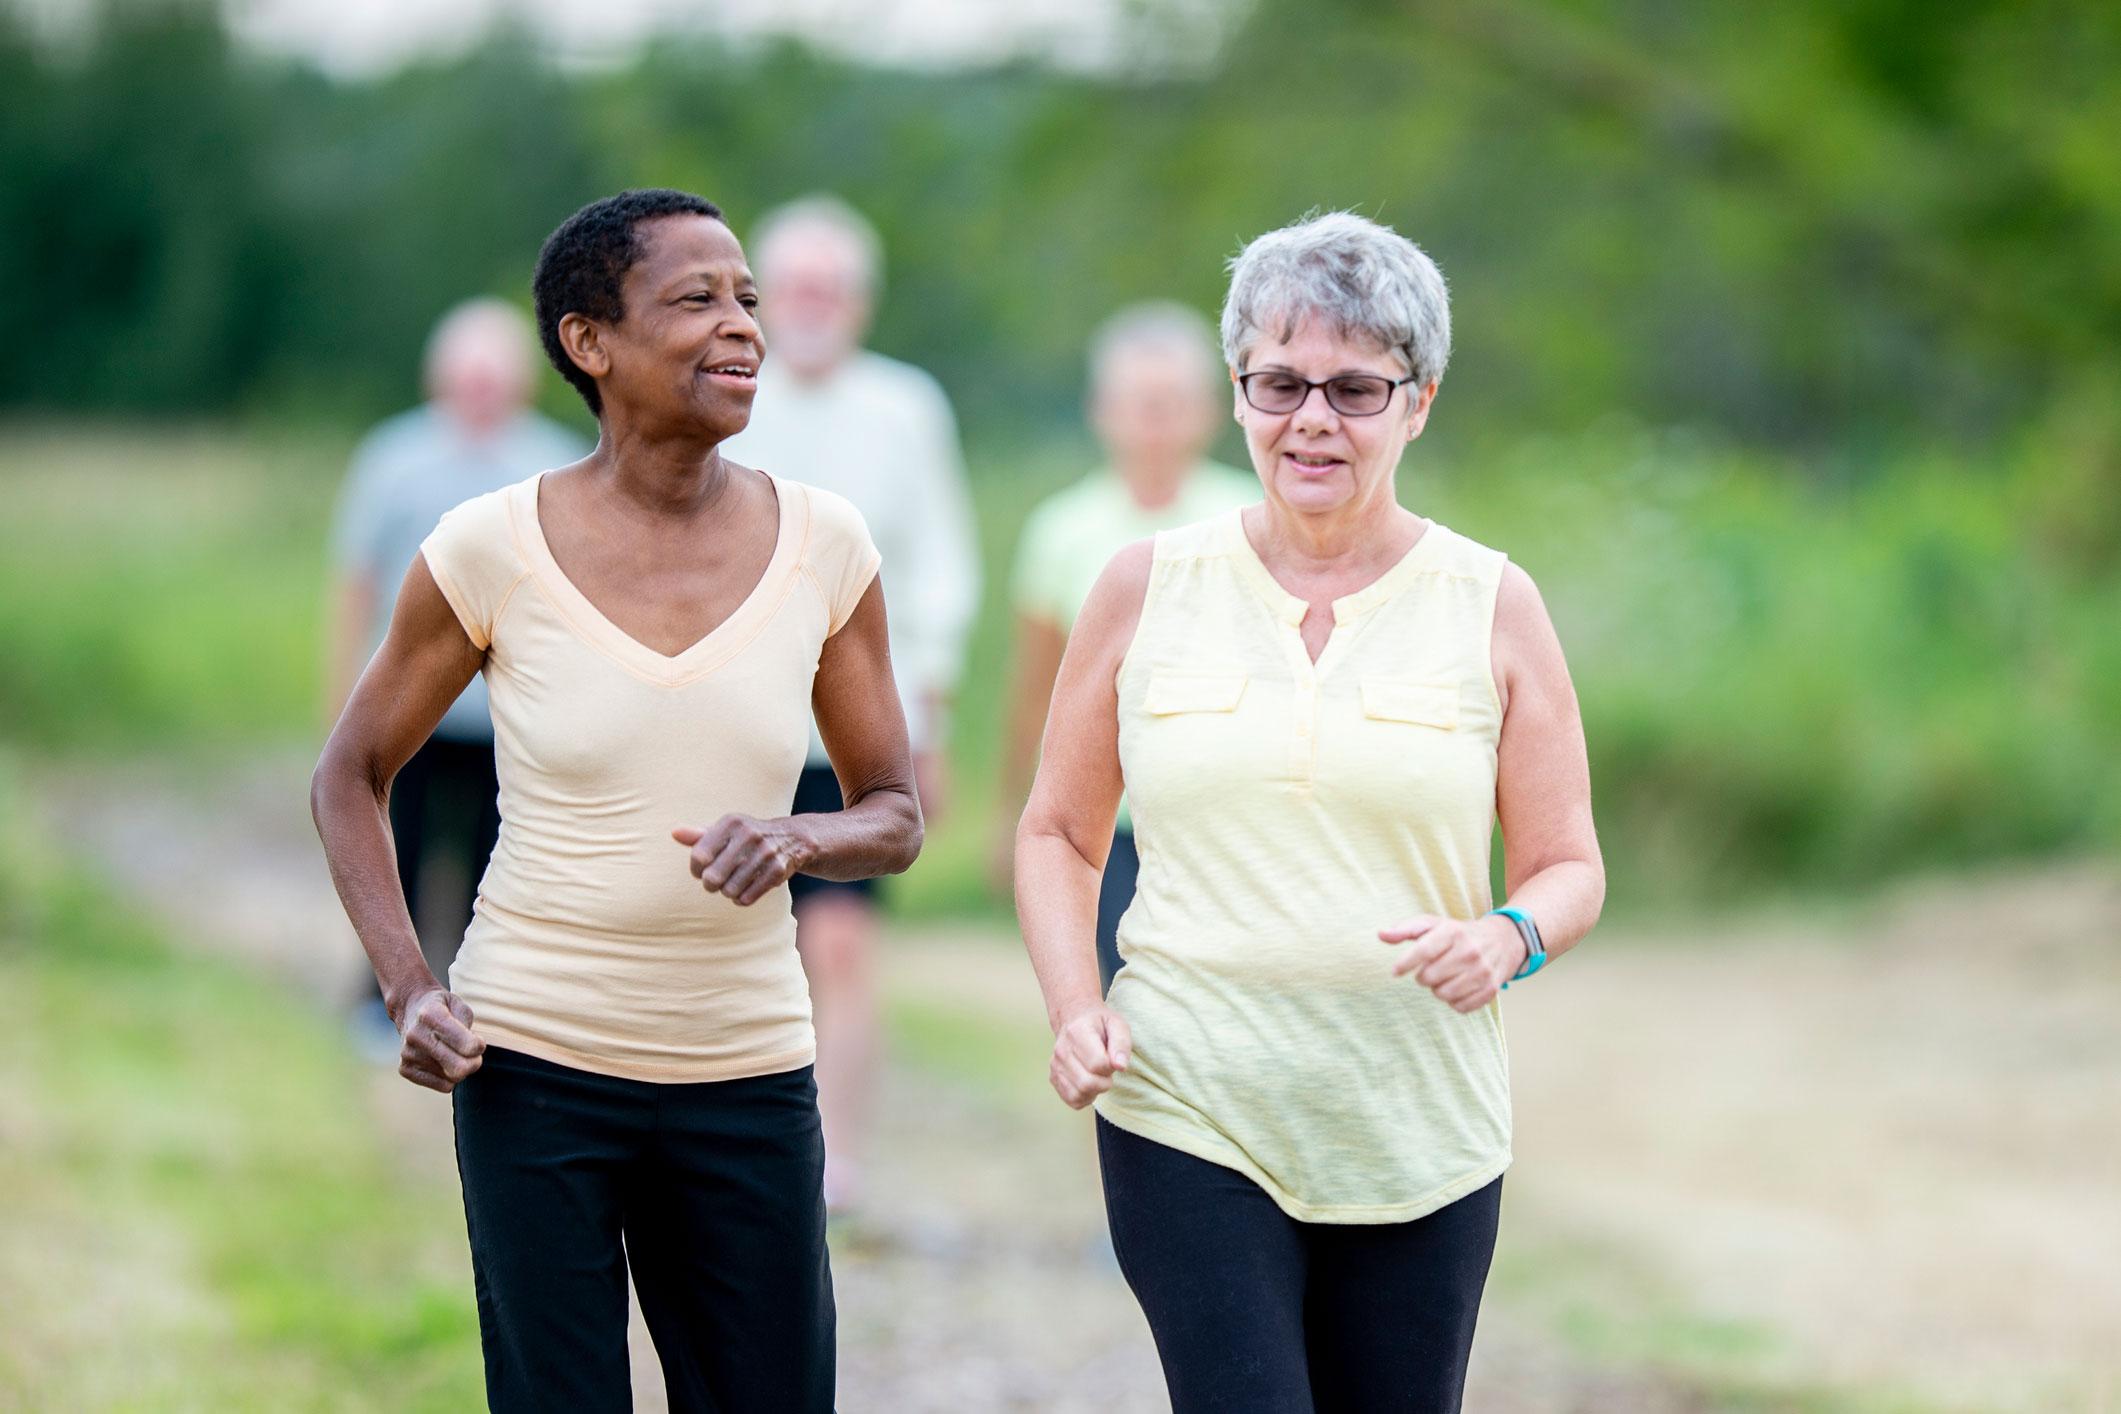 Pulmonary Hypertension? New Program Addresses Underdiagnosed High Blood Pressure